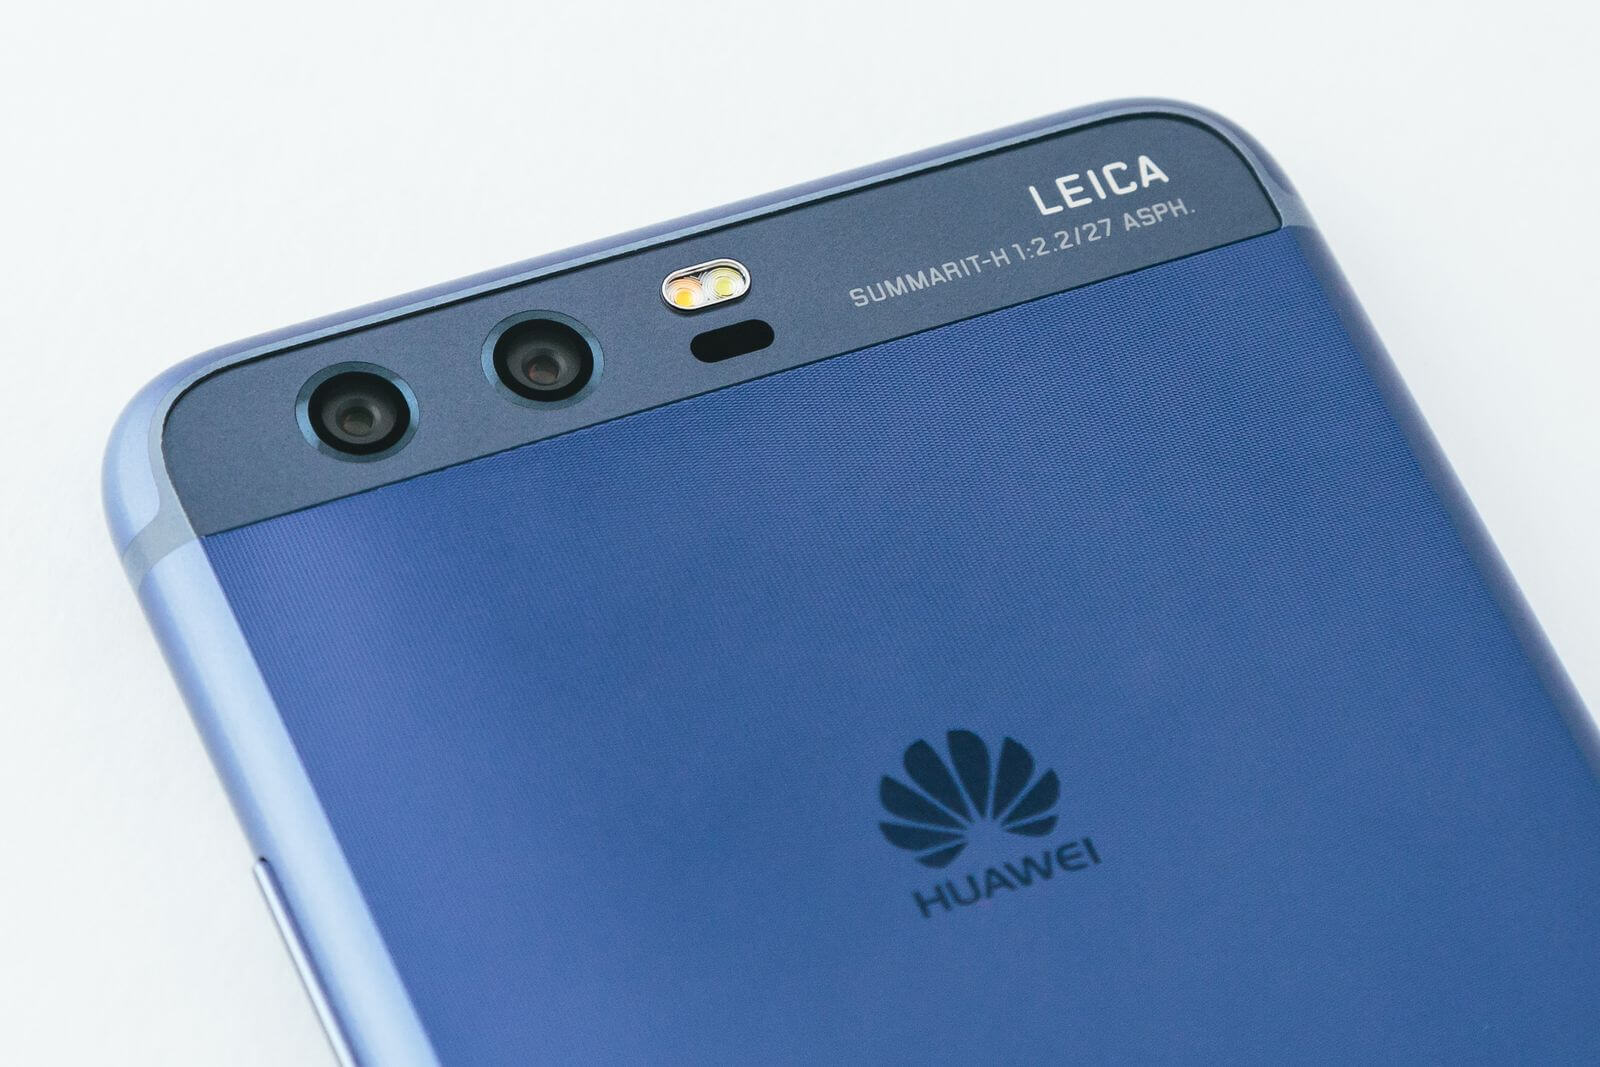 P10 Blau, Bild: Huawei